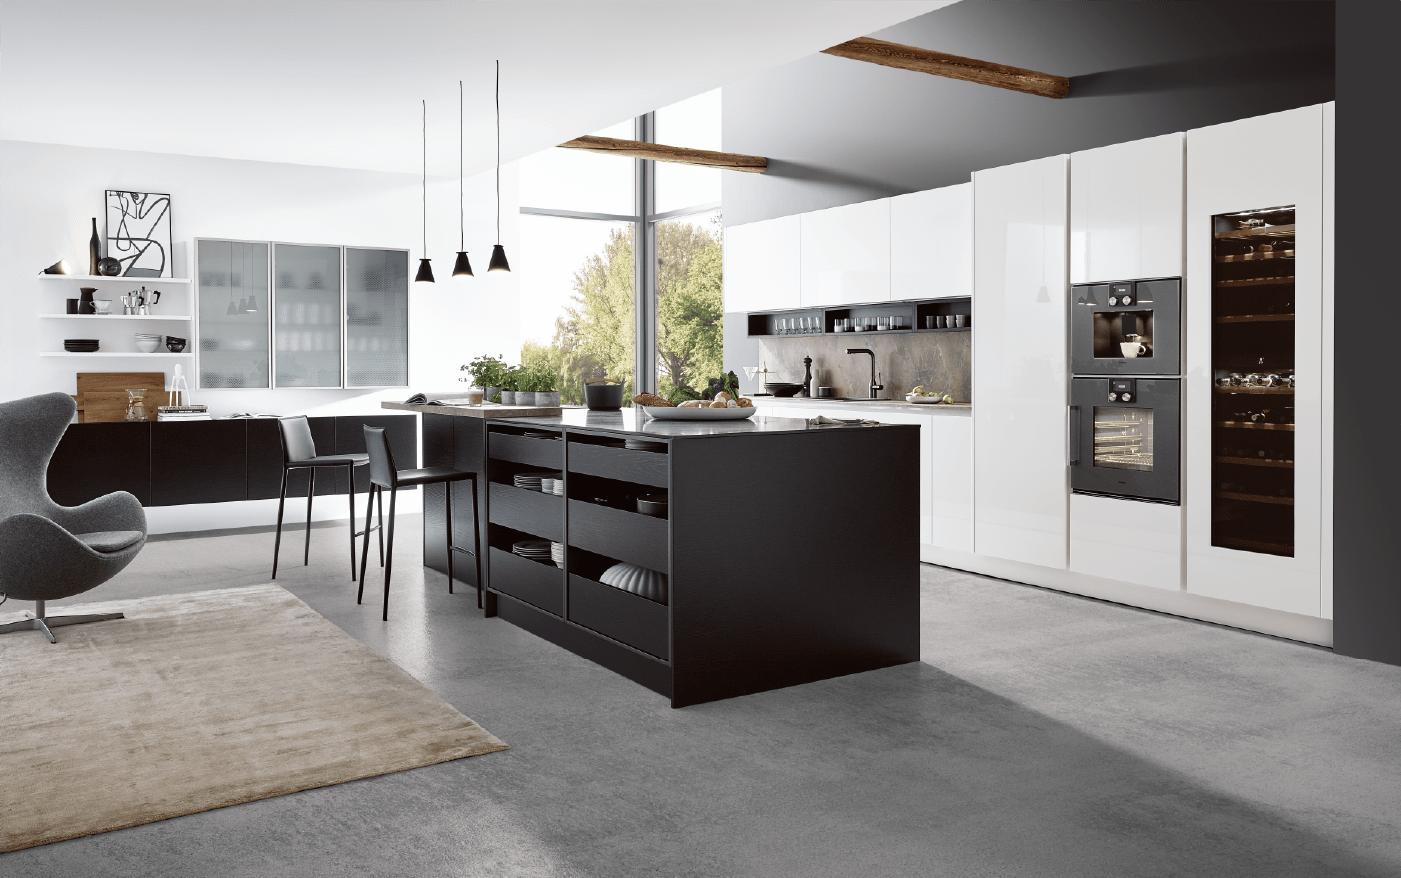 Cabeo-keukens-1-keuken-foto-9